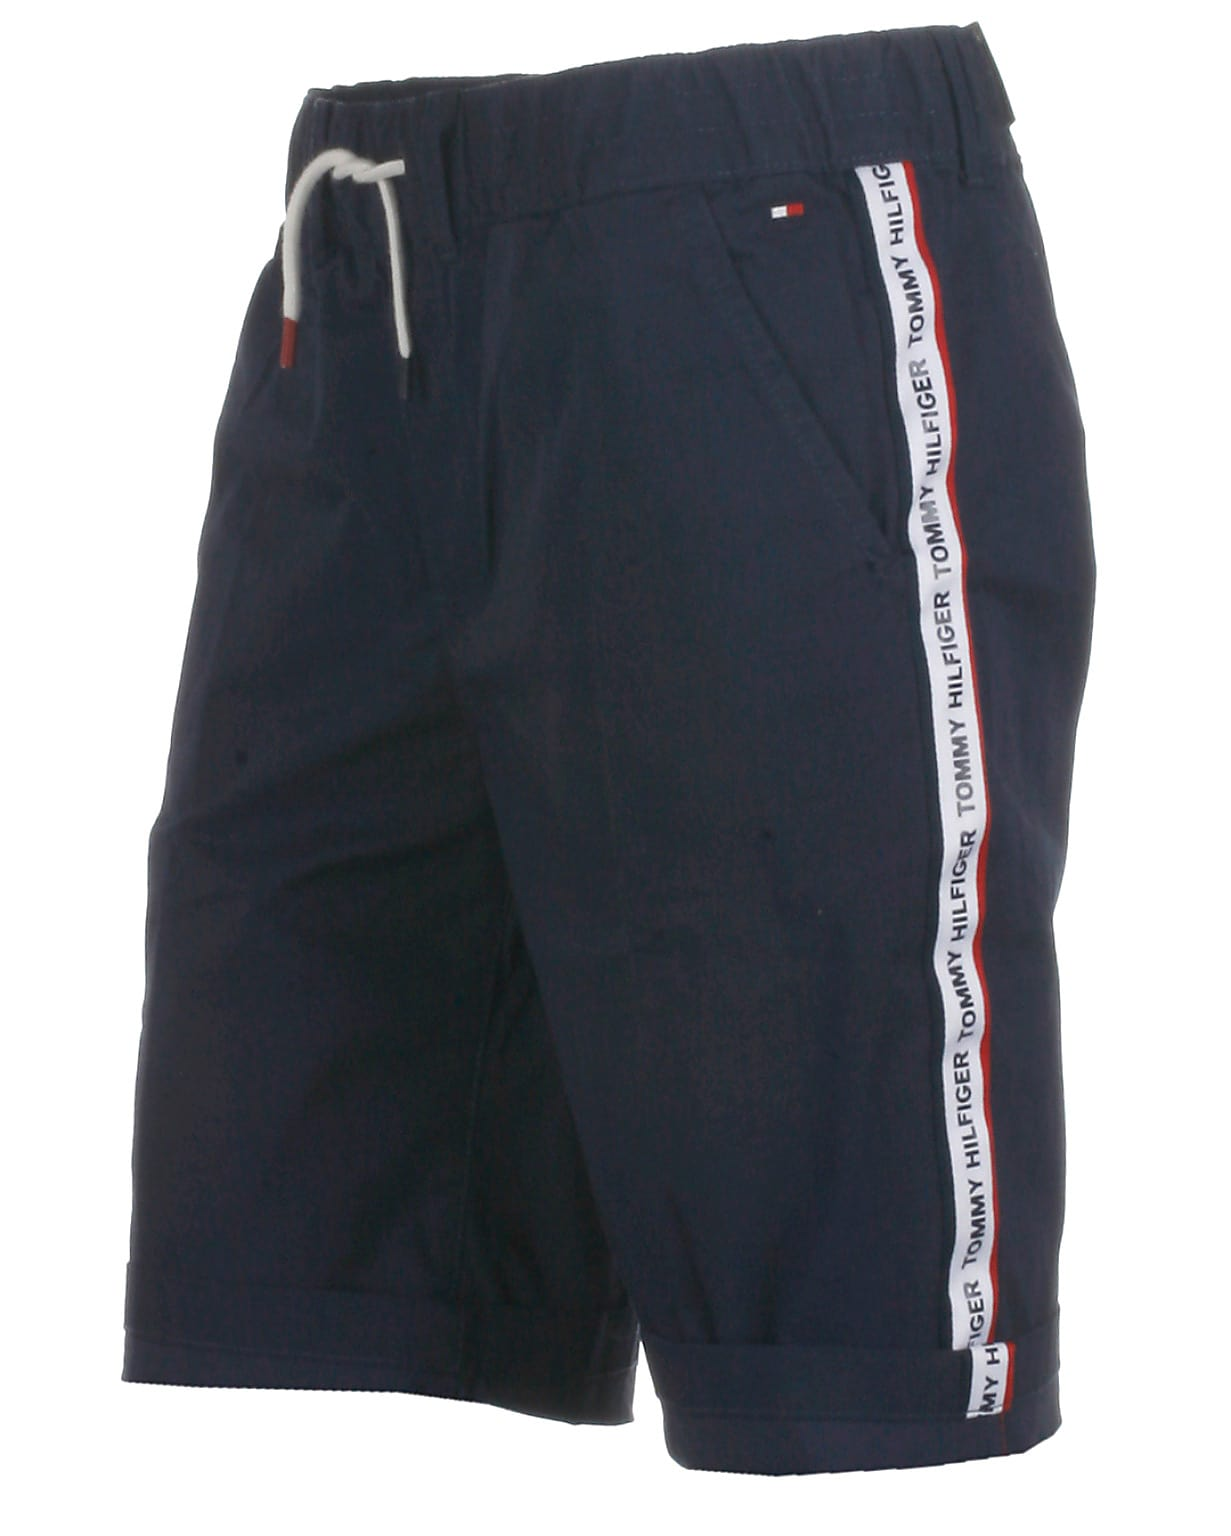 9932b62f83e Tommy Hilfiger chino shorts, Tape, navy